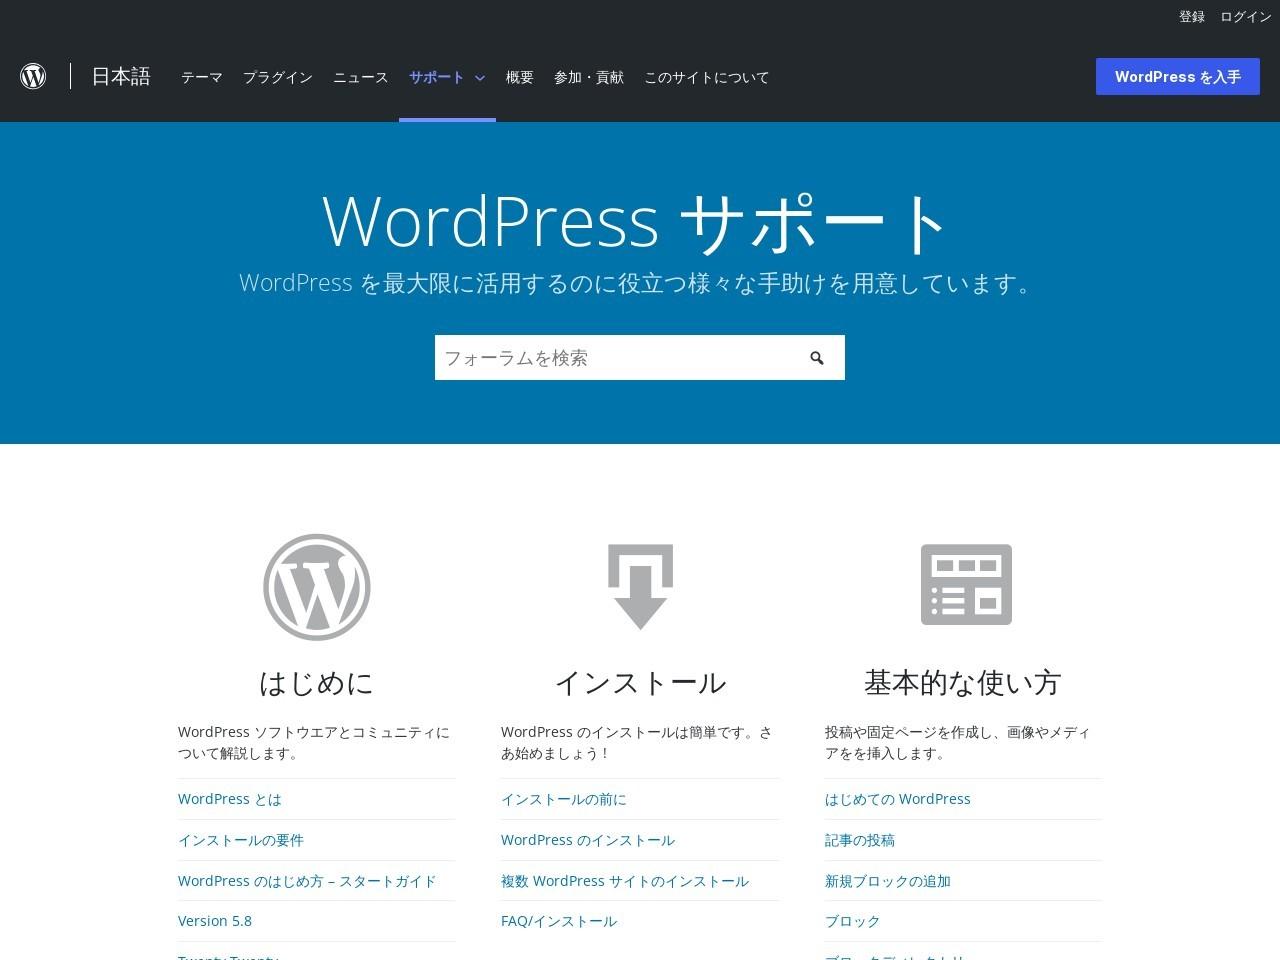 http://ja.forums.wordpress.org/topic/24503